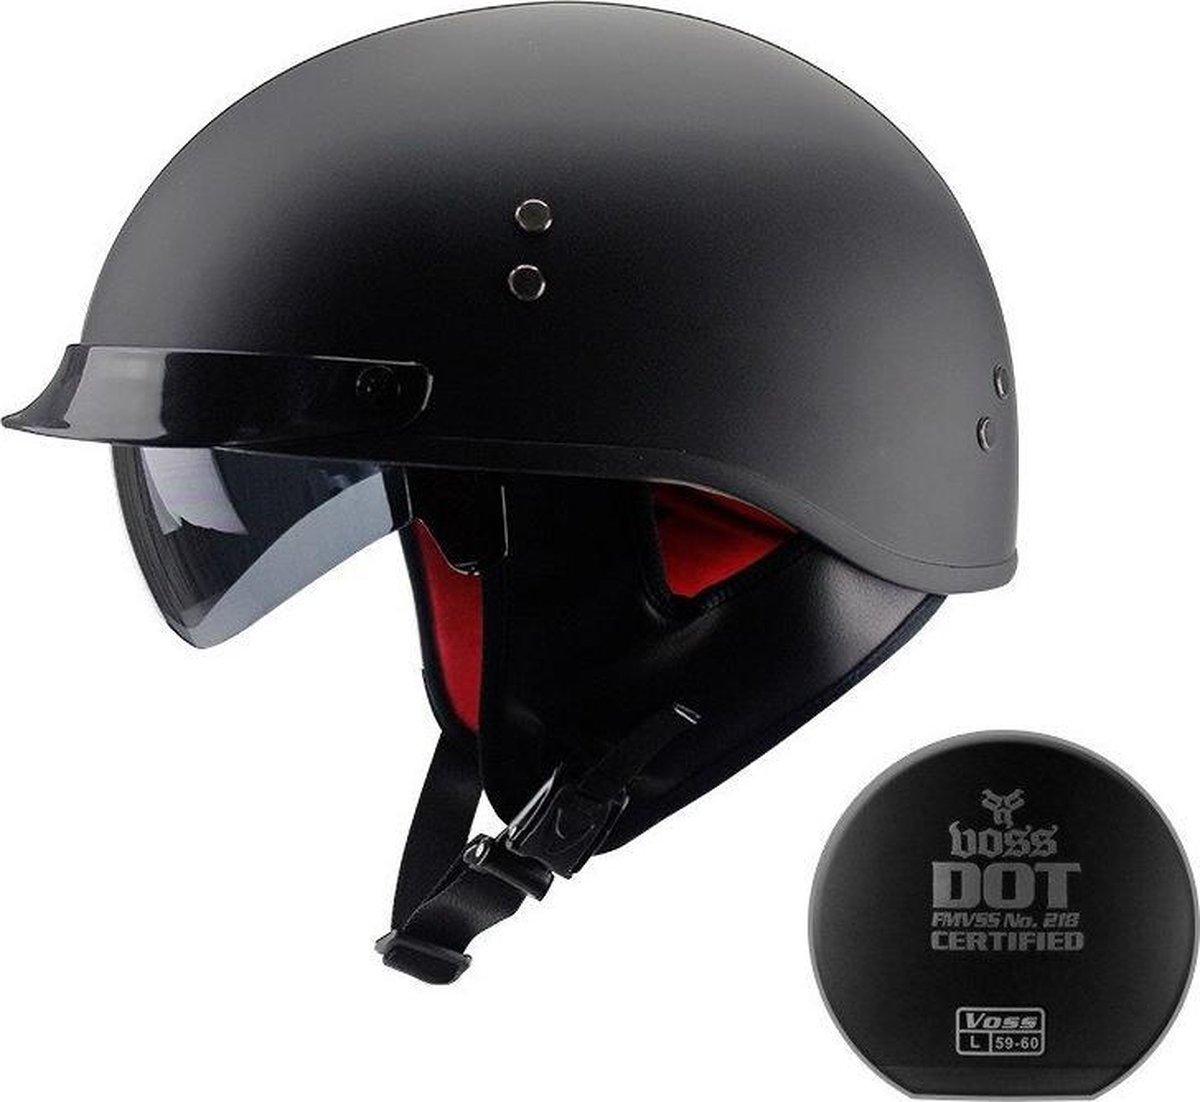 Vintage Motorhelm - Open Helm - Dot Goedgekeurd - Half Helm Retro - Zwart - Maat XL